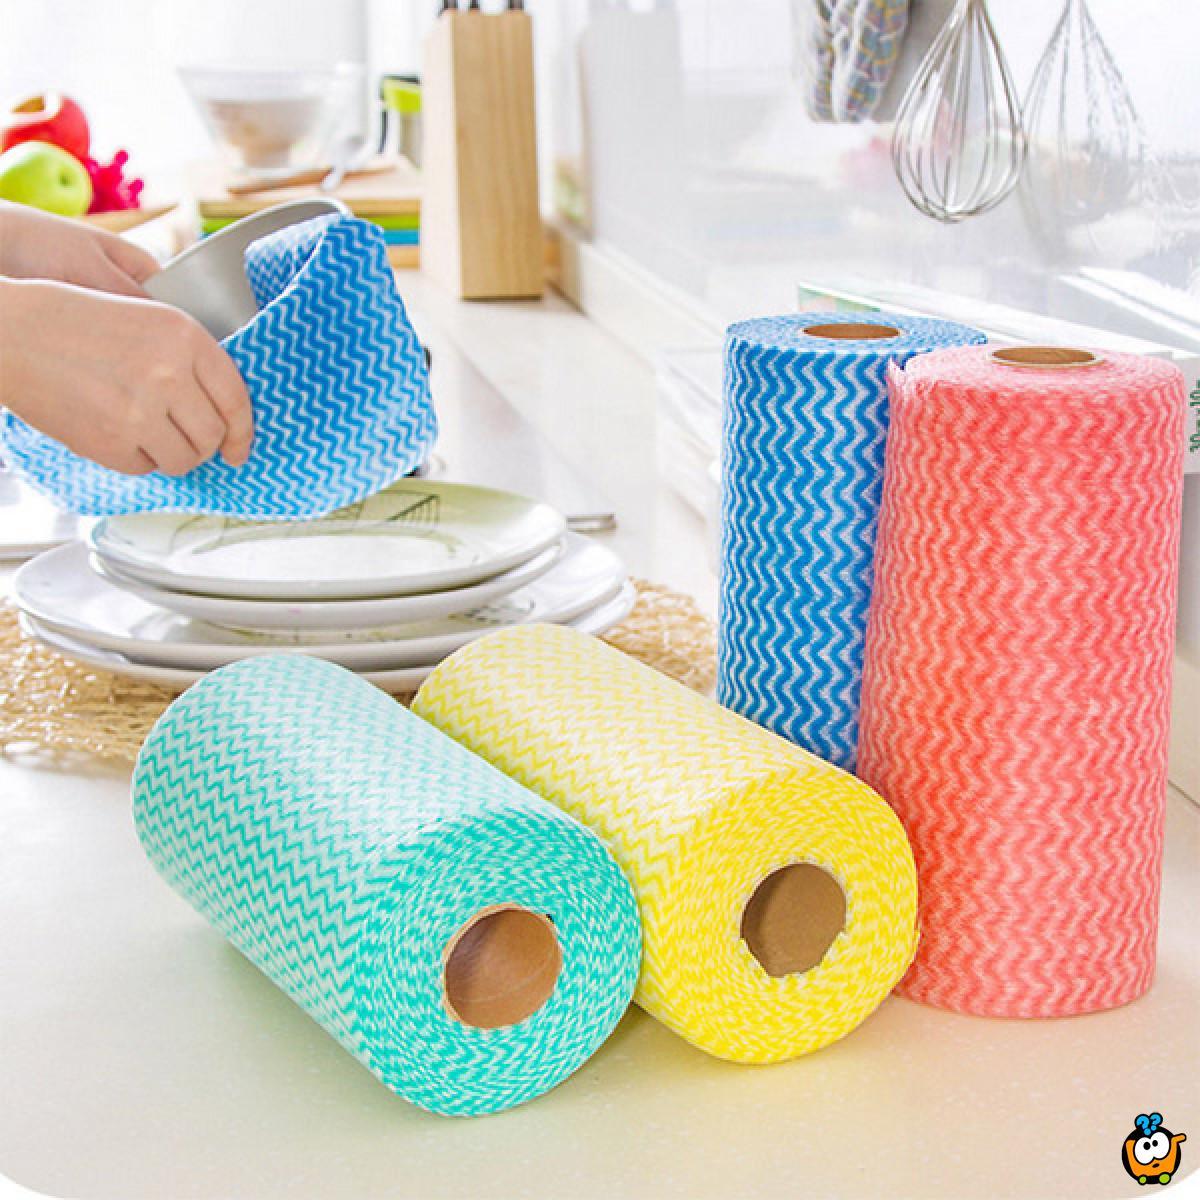 Cleaning cloth - Multifunkcionalna kuhinjska krpa u rolni